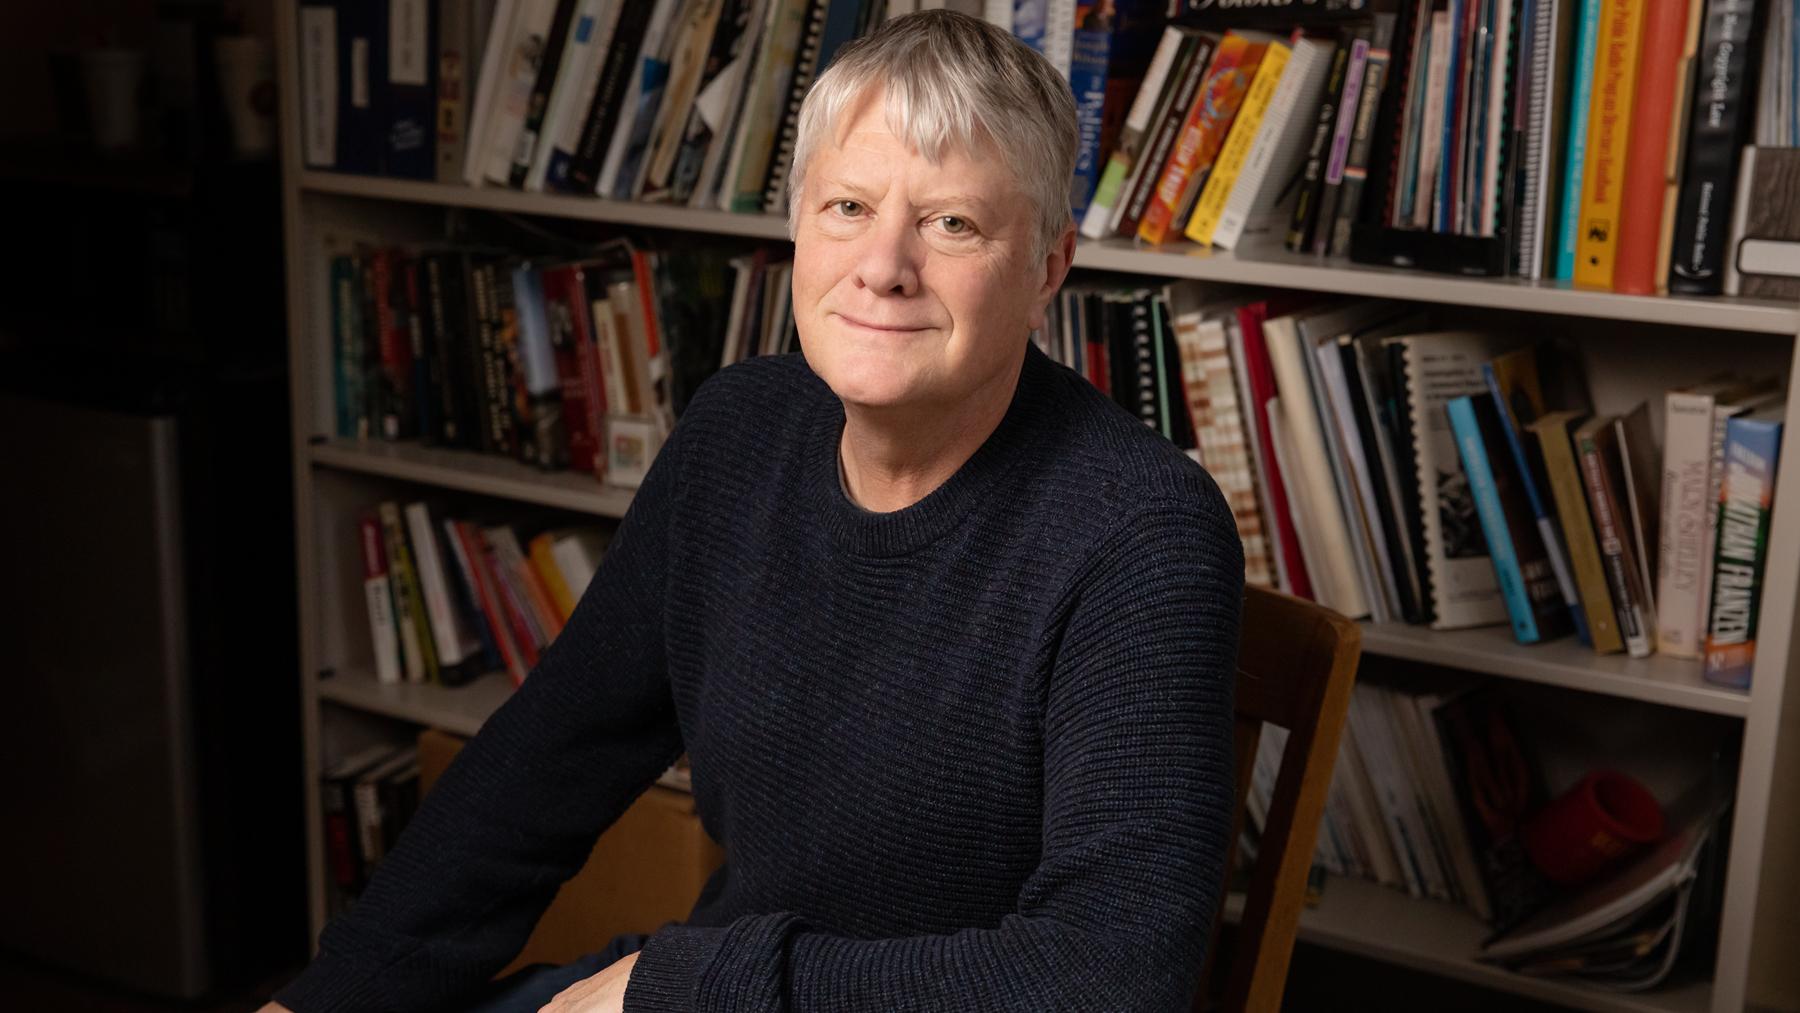 journalism professor Brant Houston. Photo by L. Brian Stauffer